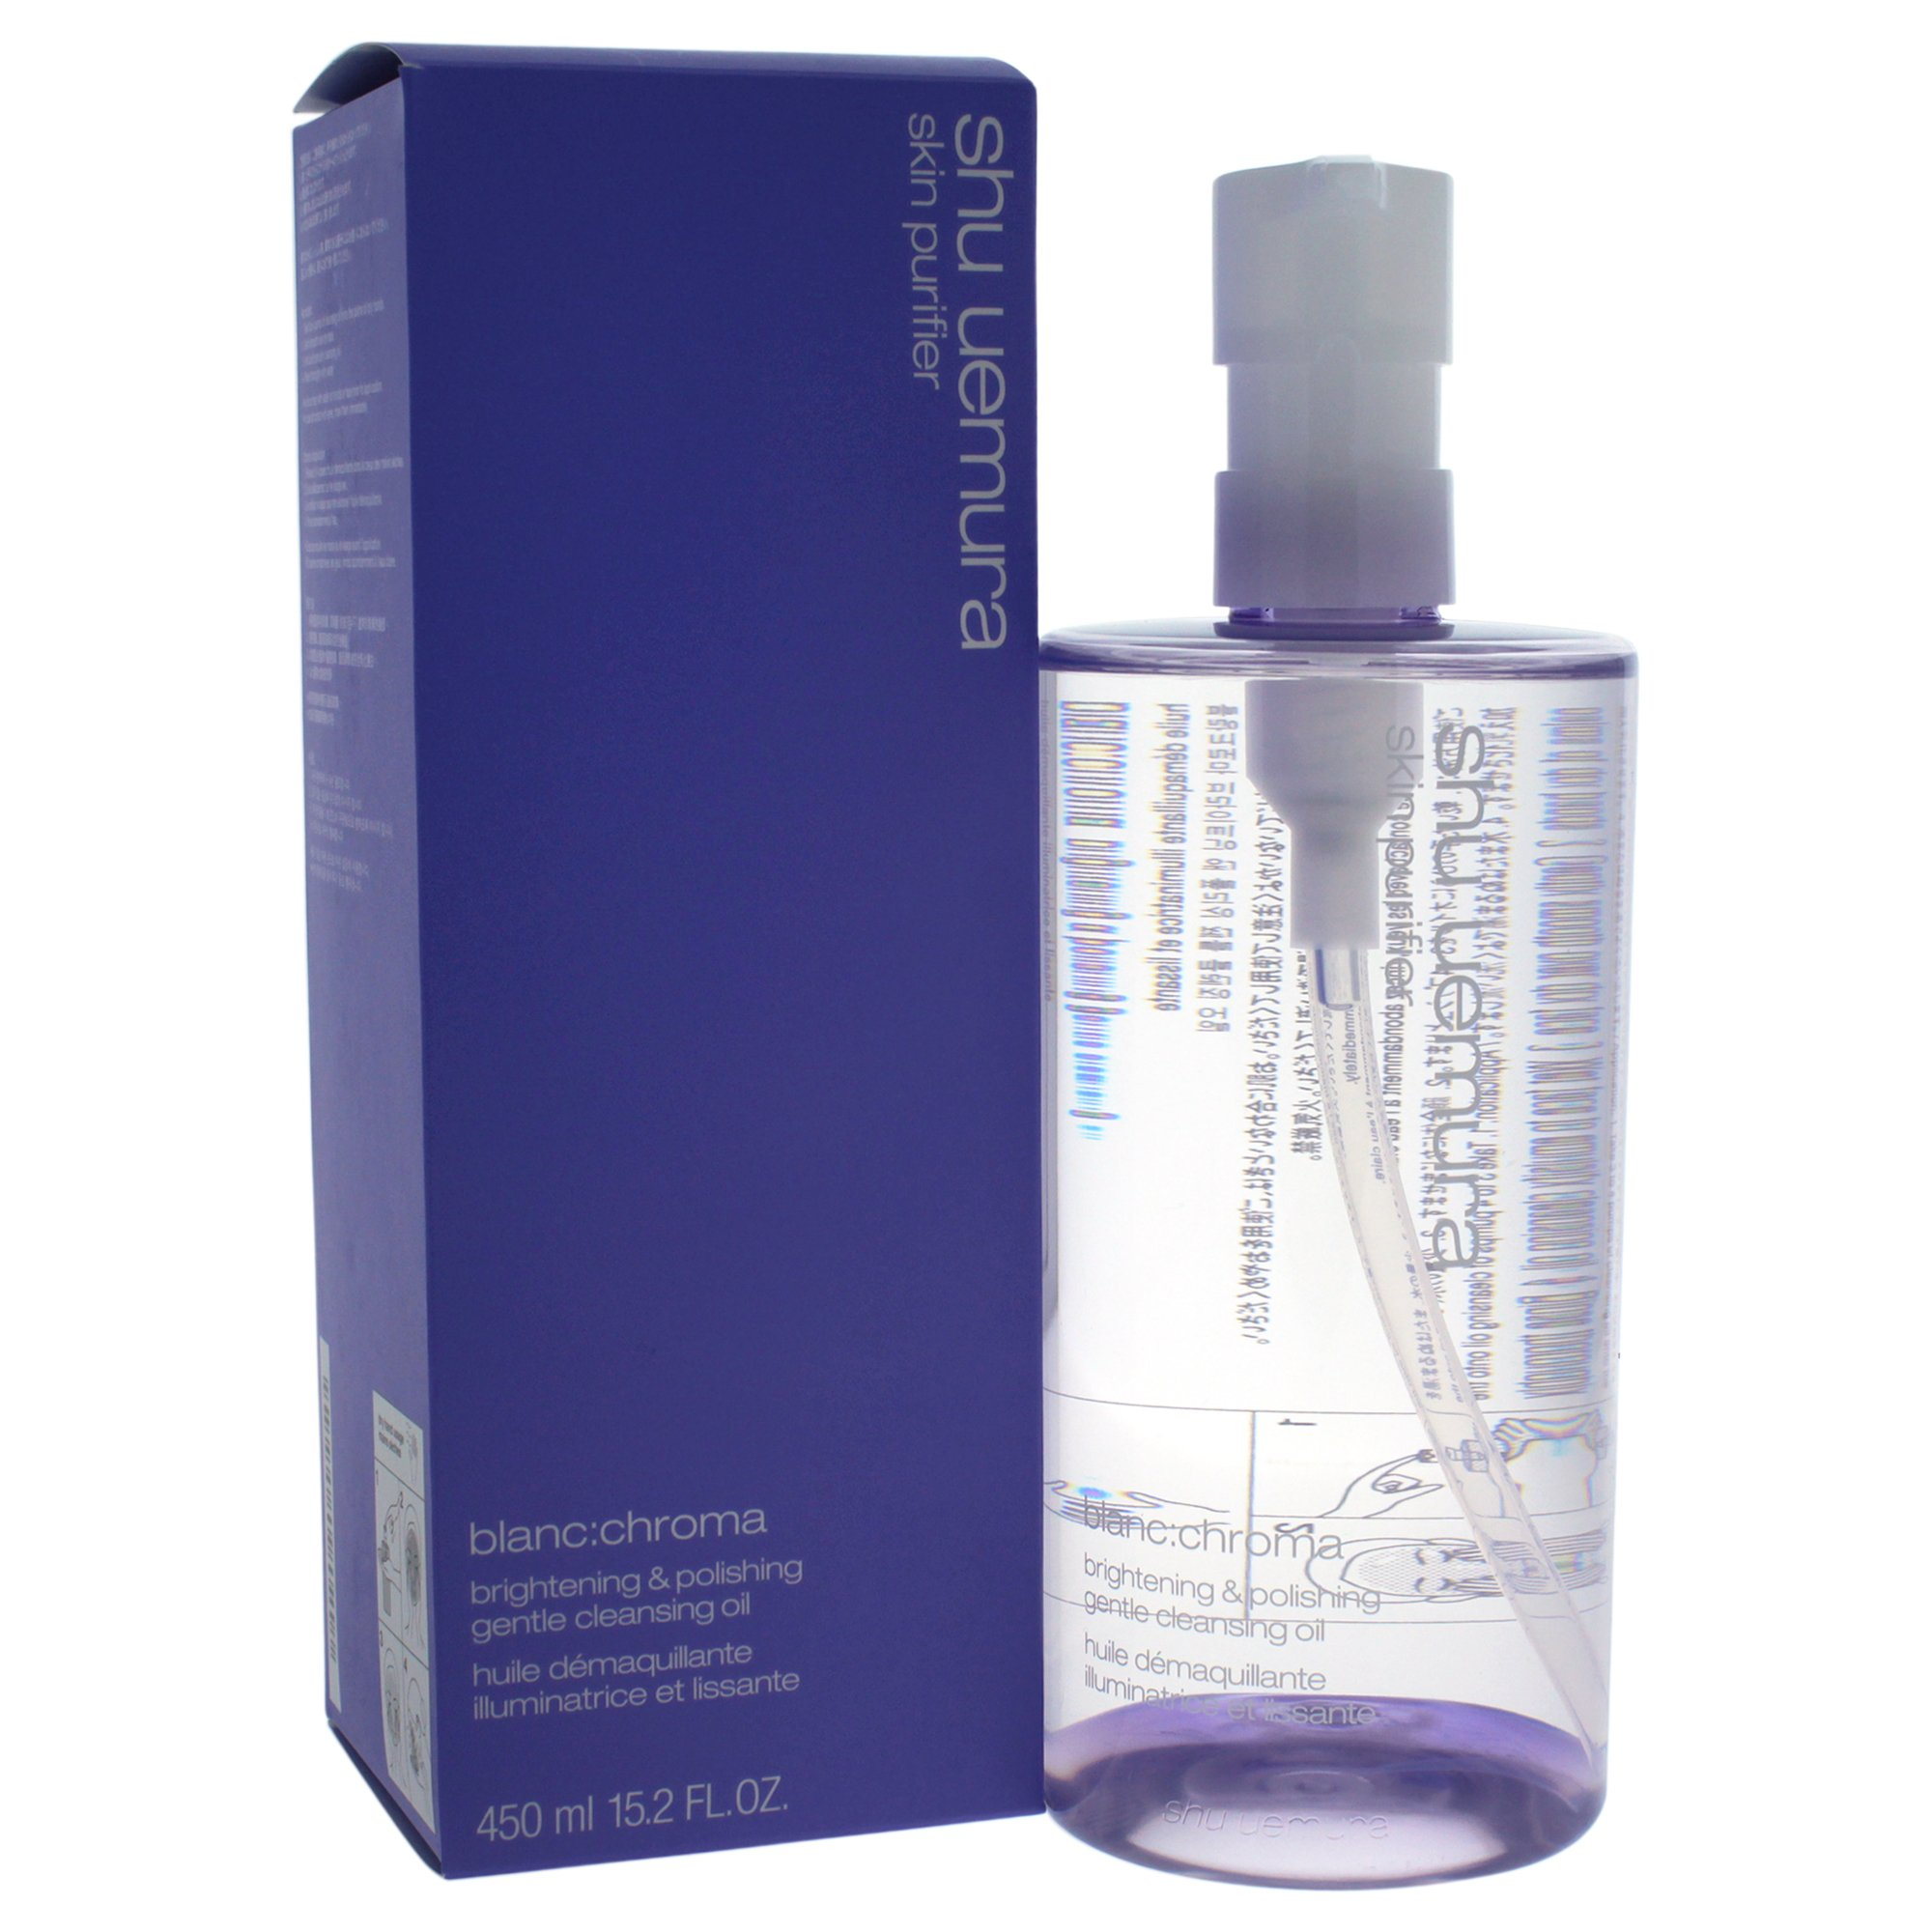 Shu Uemura Blanc:chroma Brightening and Polishing Gentle Cleansing Oil, 15.2 Ounce